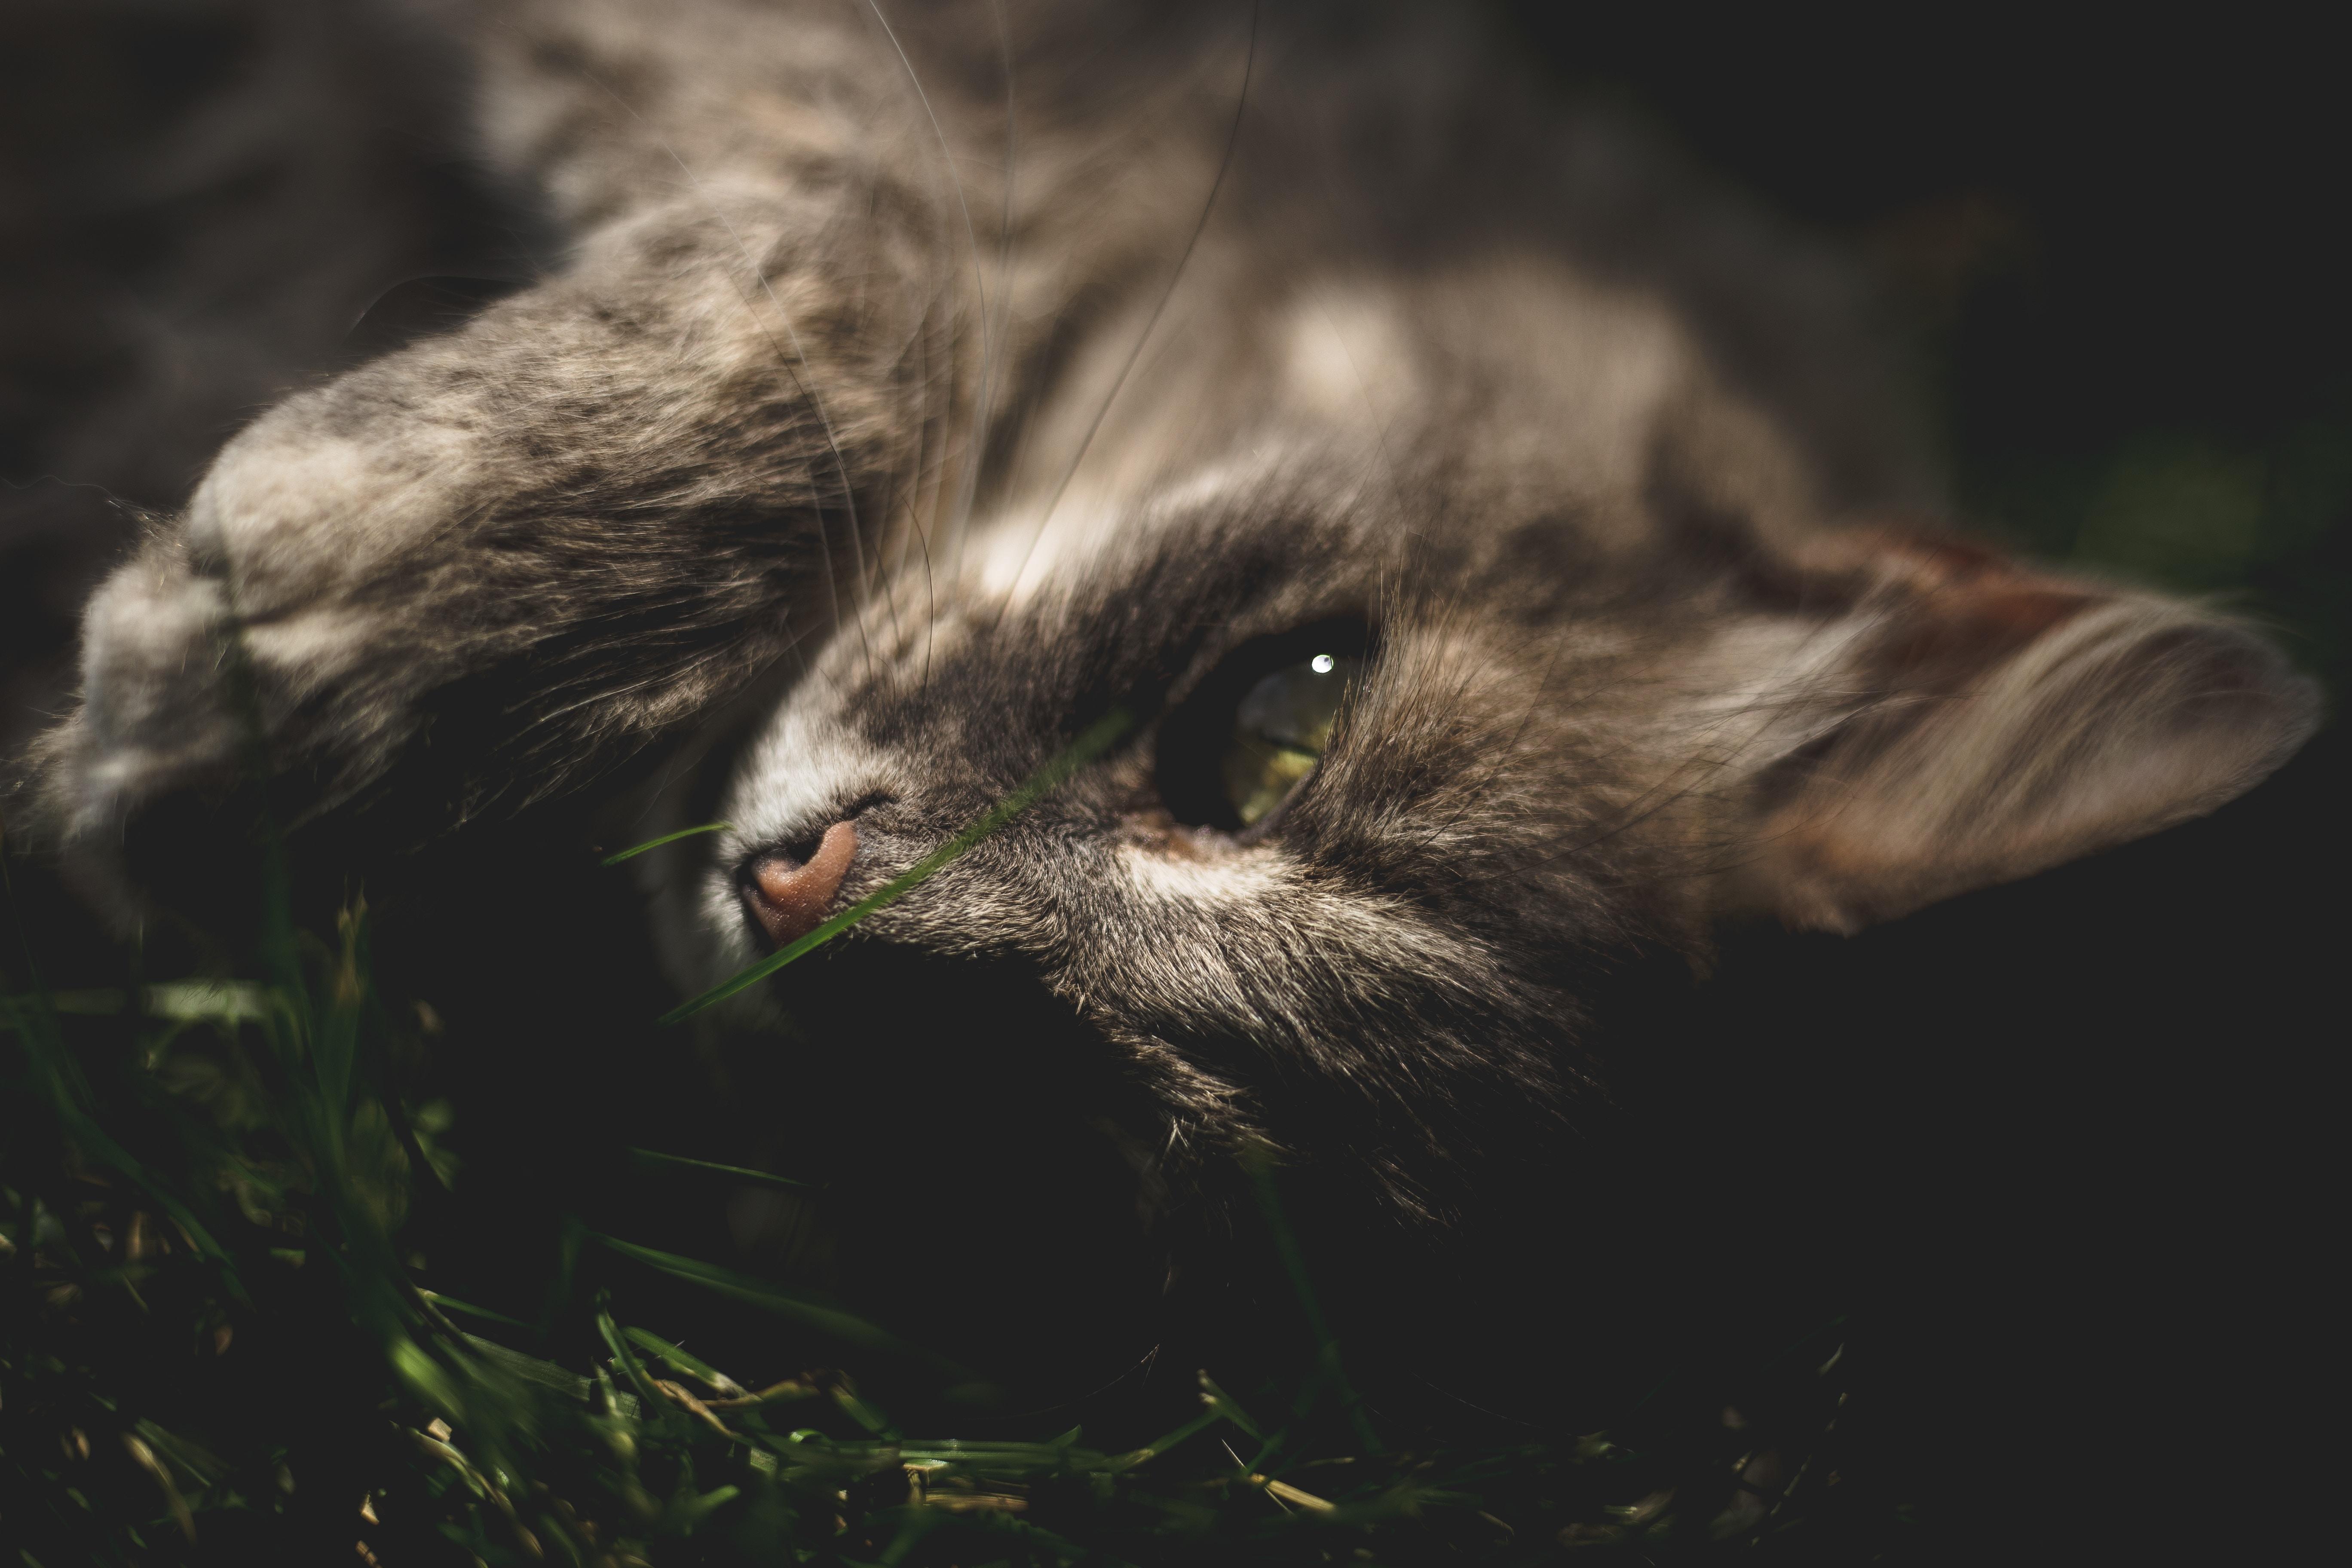 gray cat lying on grass